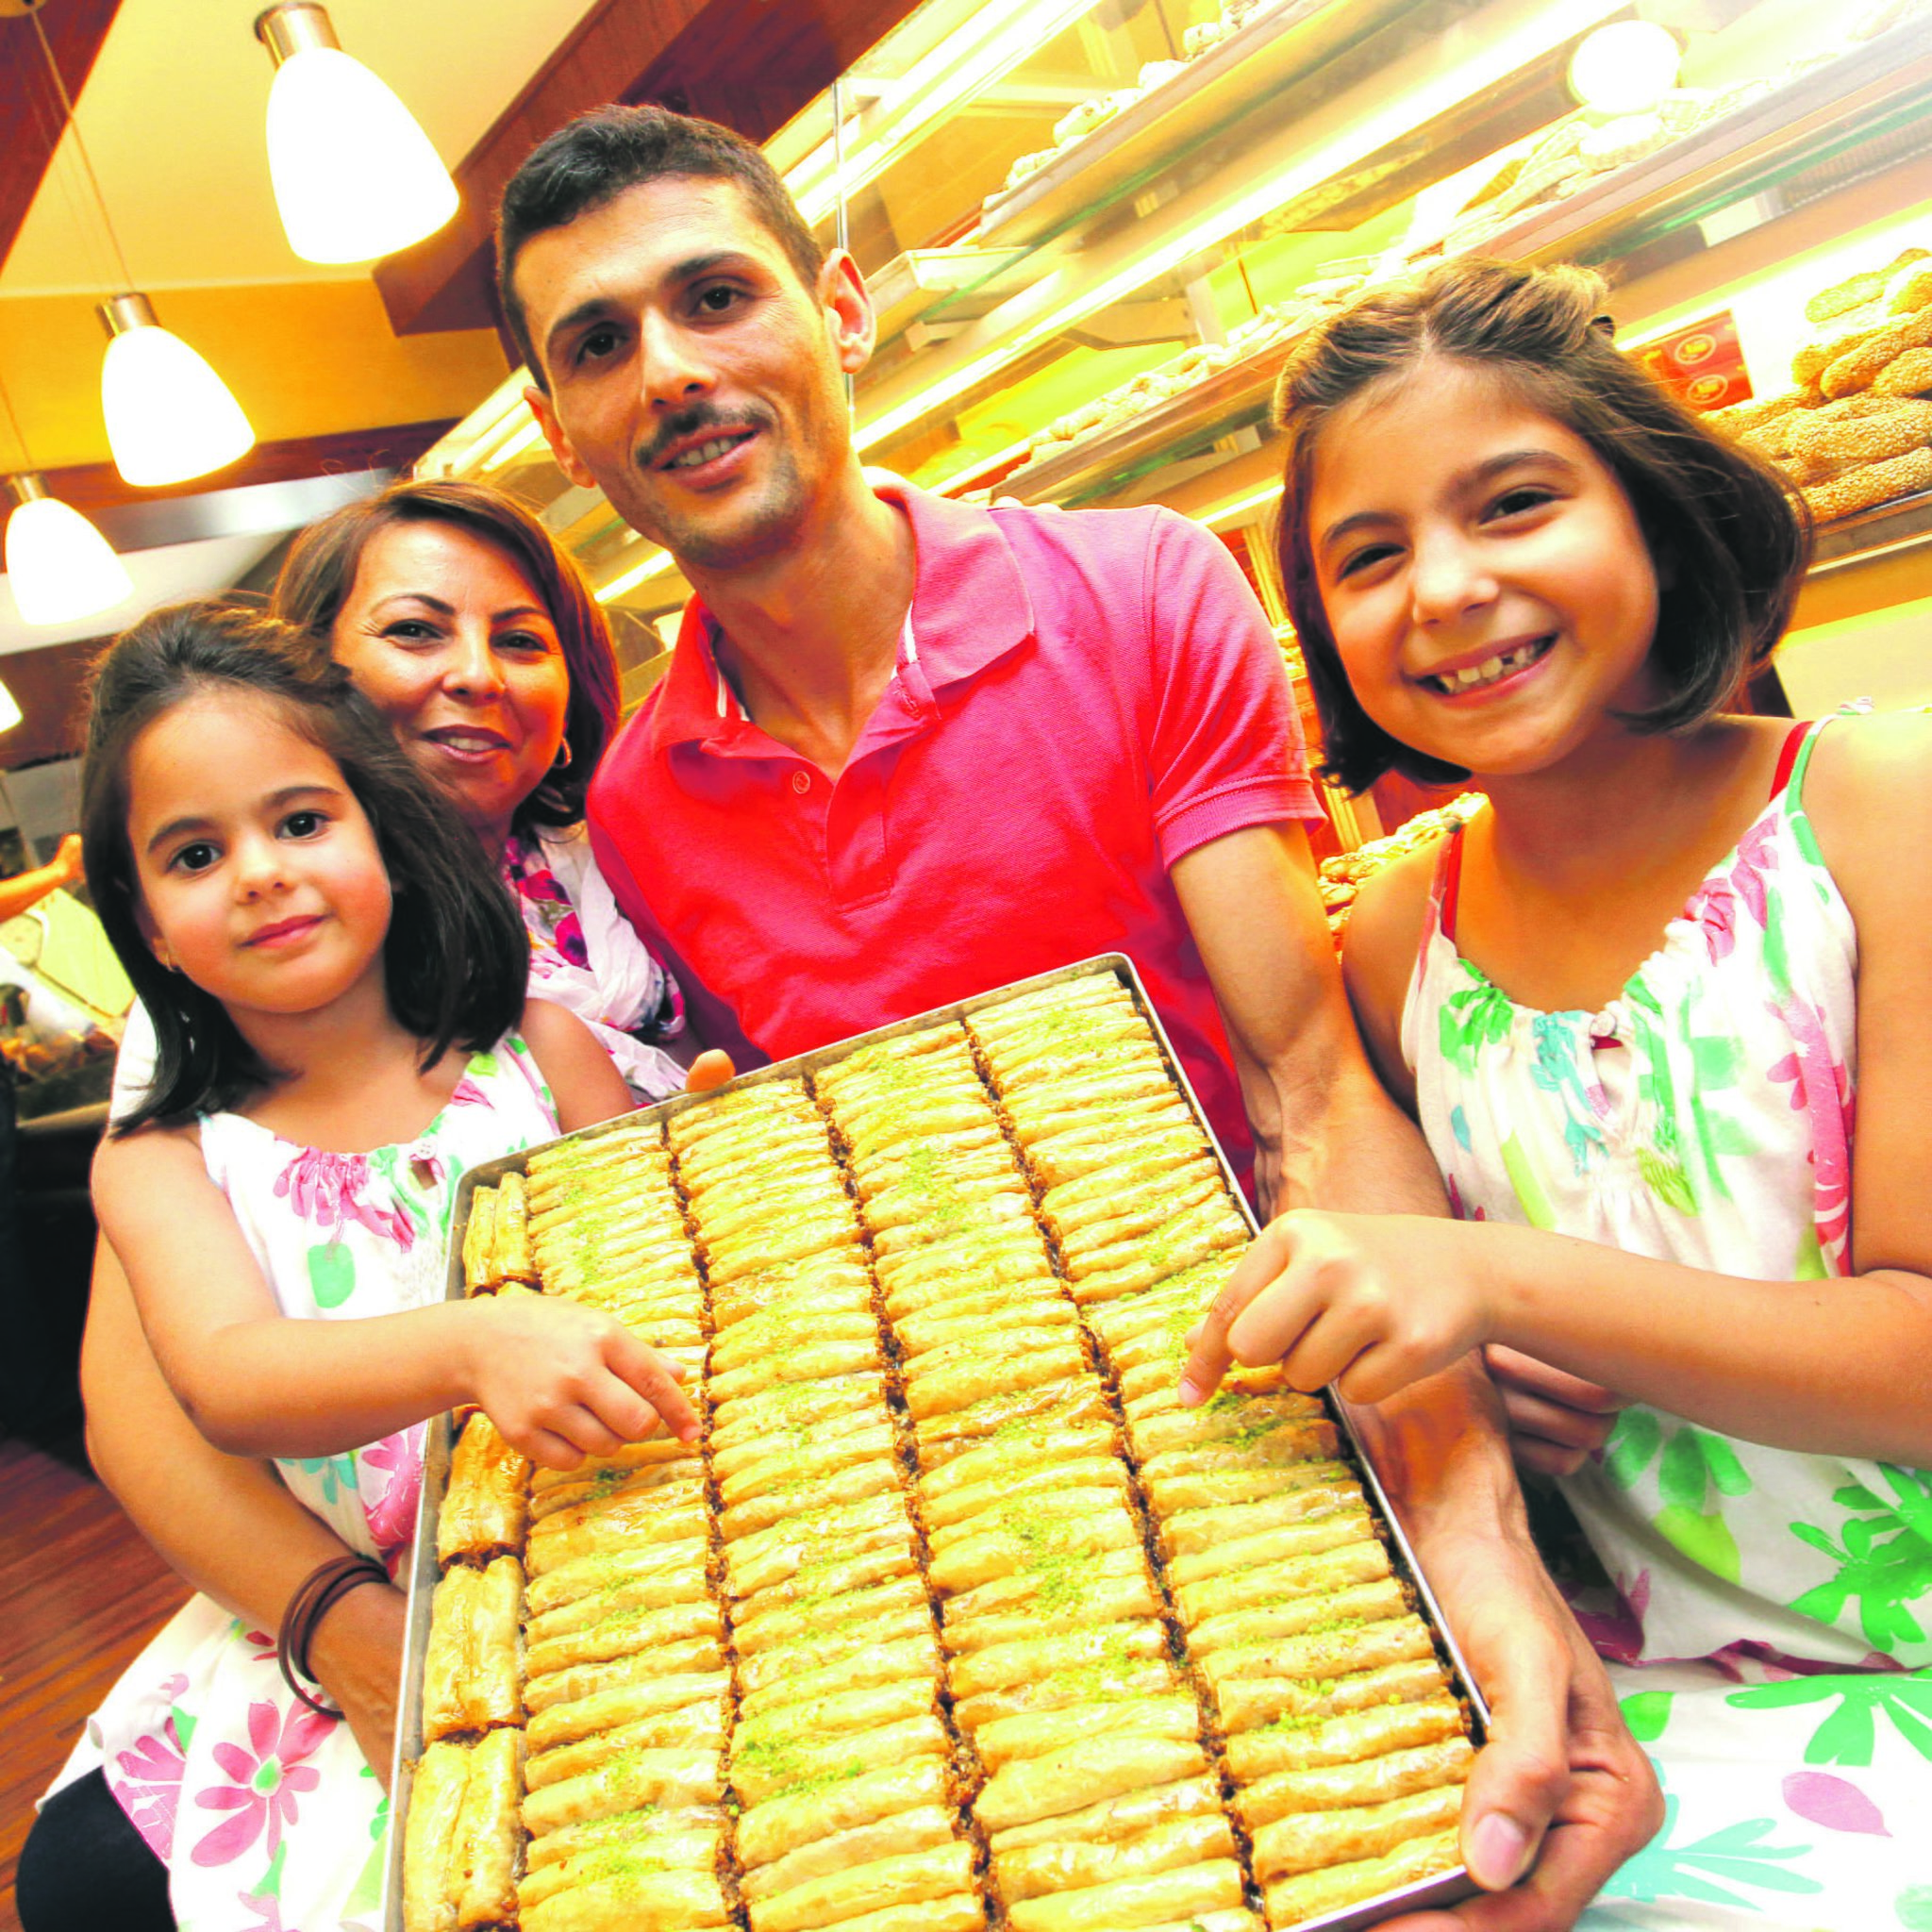 feiern muslime ostern